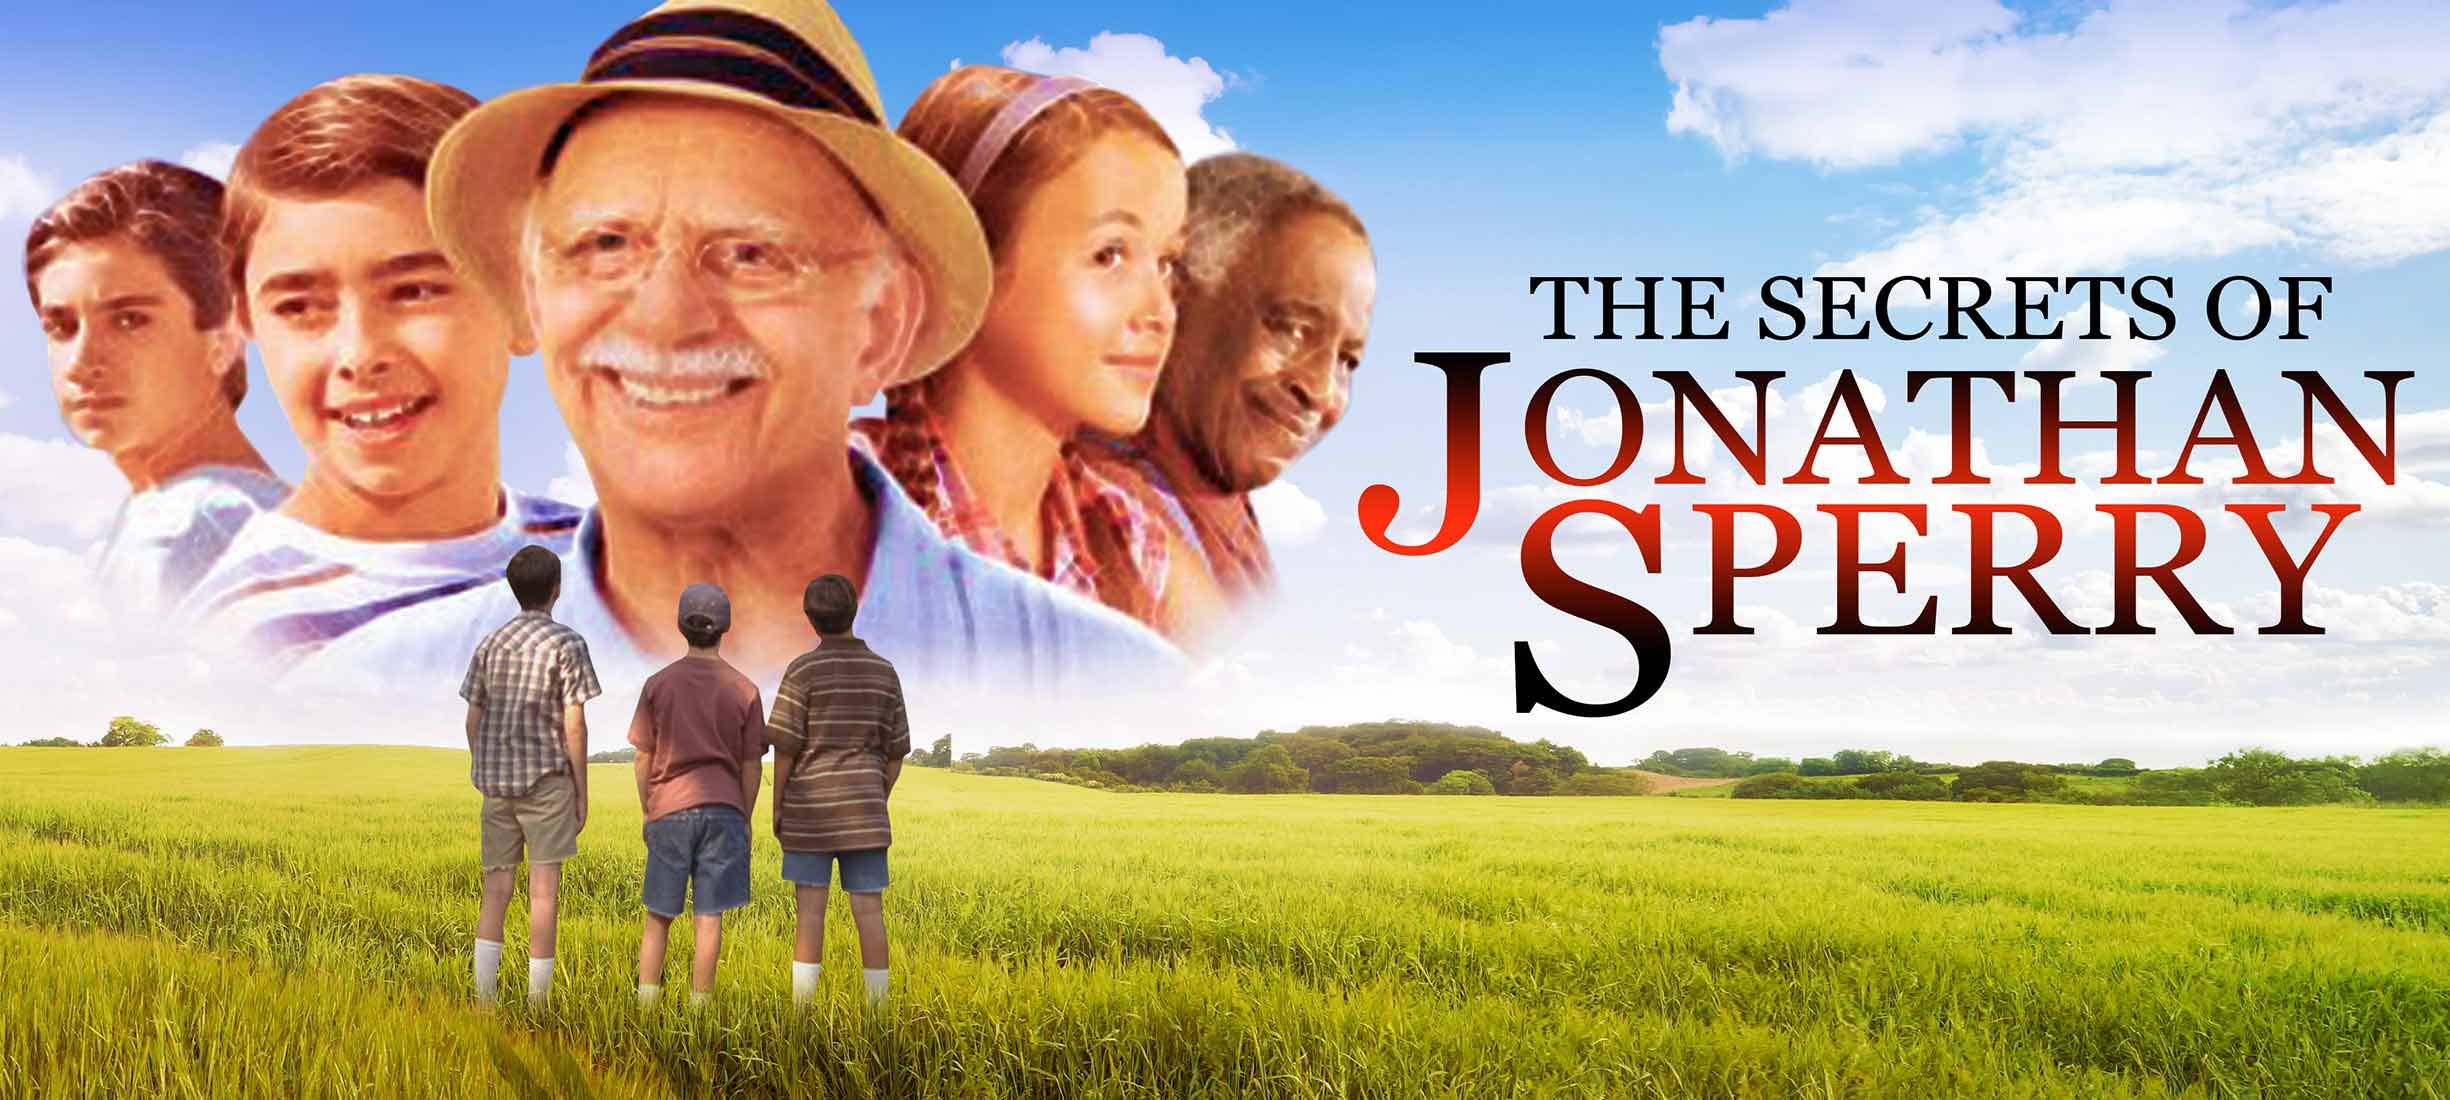 the secrets of jonathan sperry true story